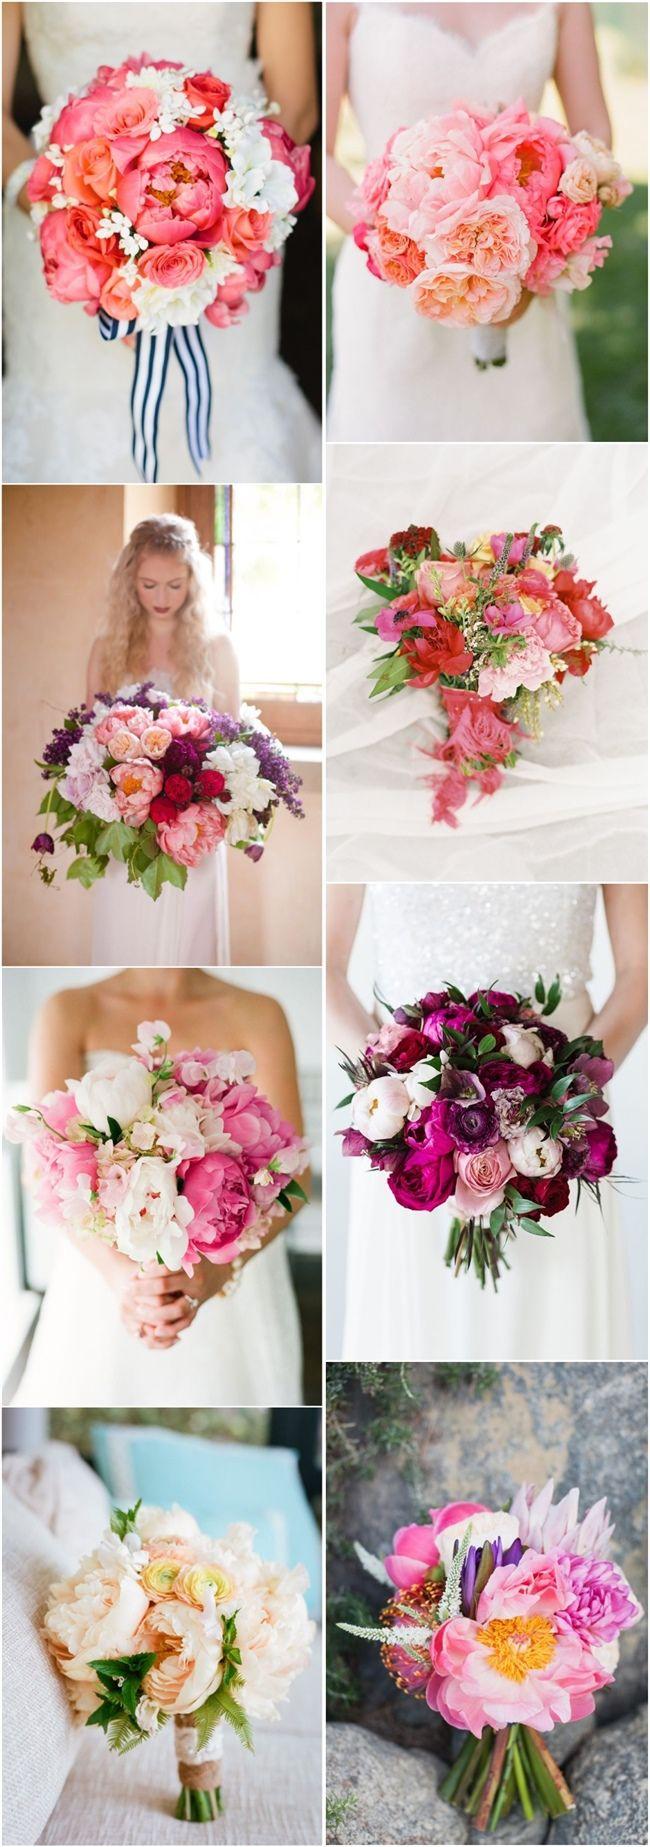 wedding bouquet ideas  peonies wedding bouquets flowers